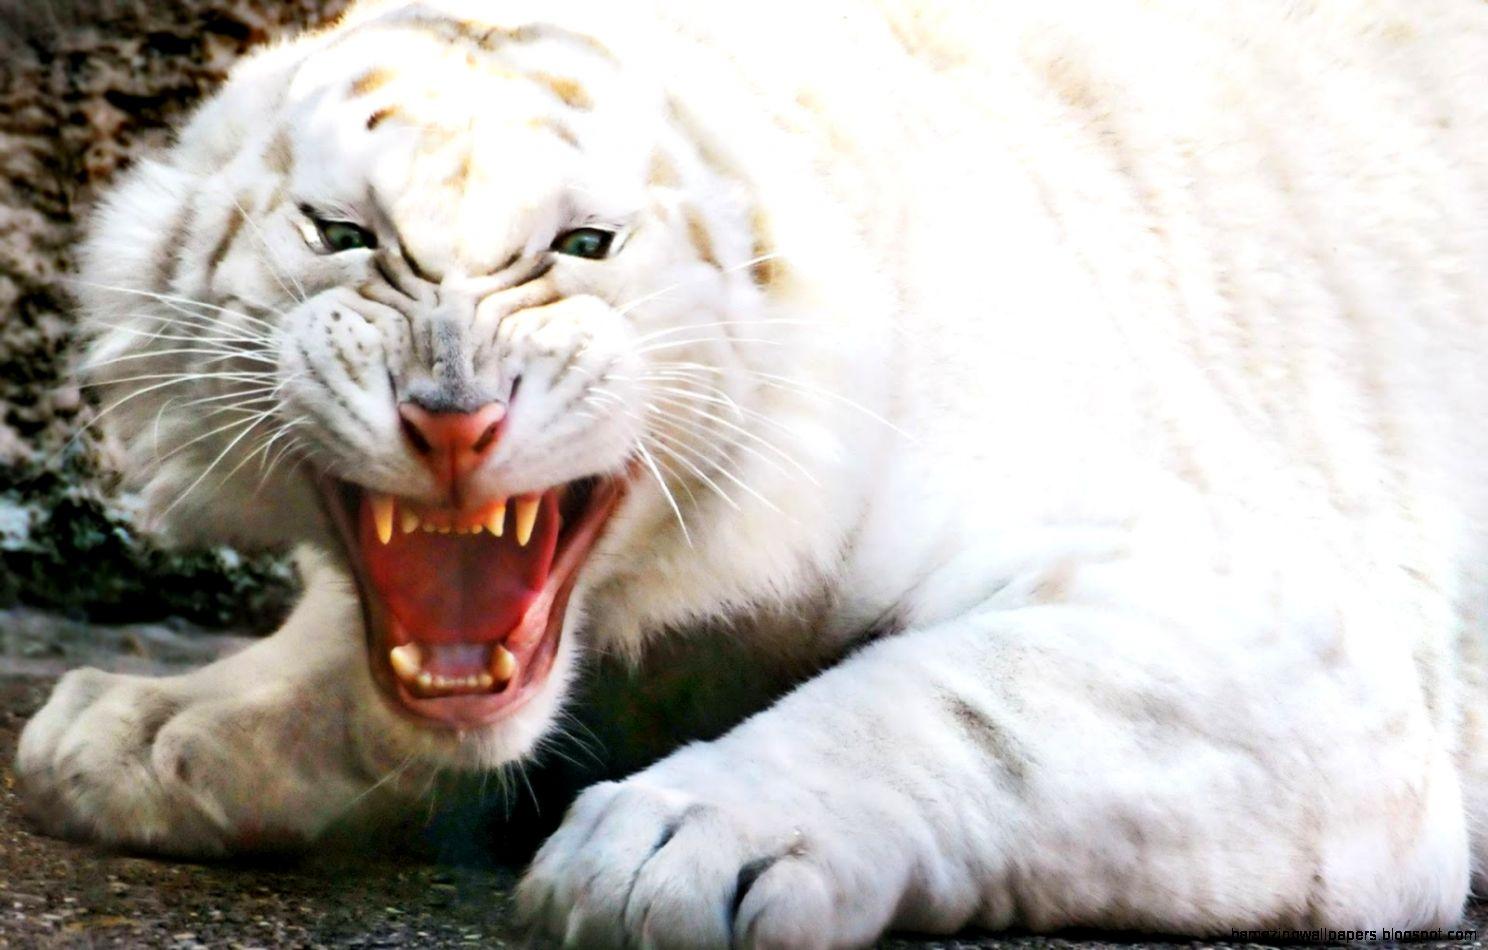 White Lion Wallpaper Hd 1080p Amazing Wallpapers